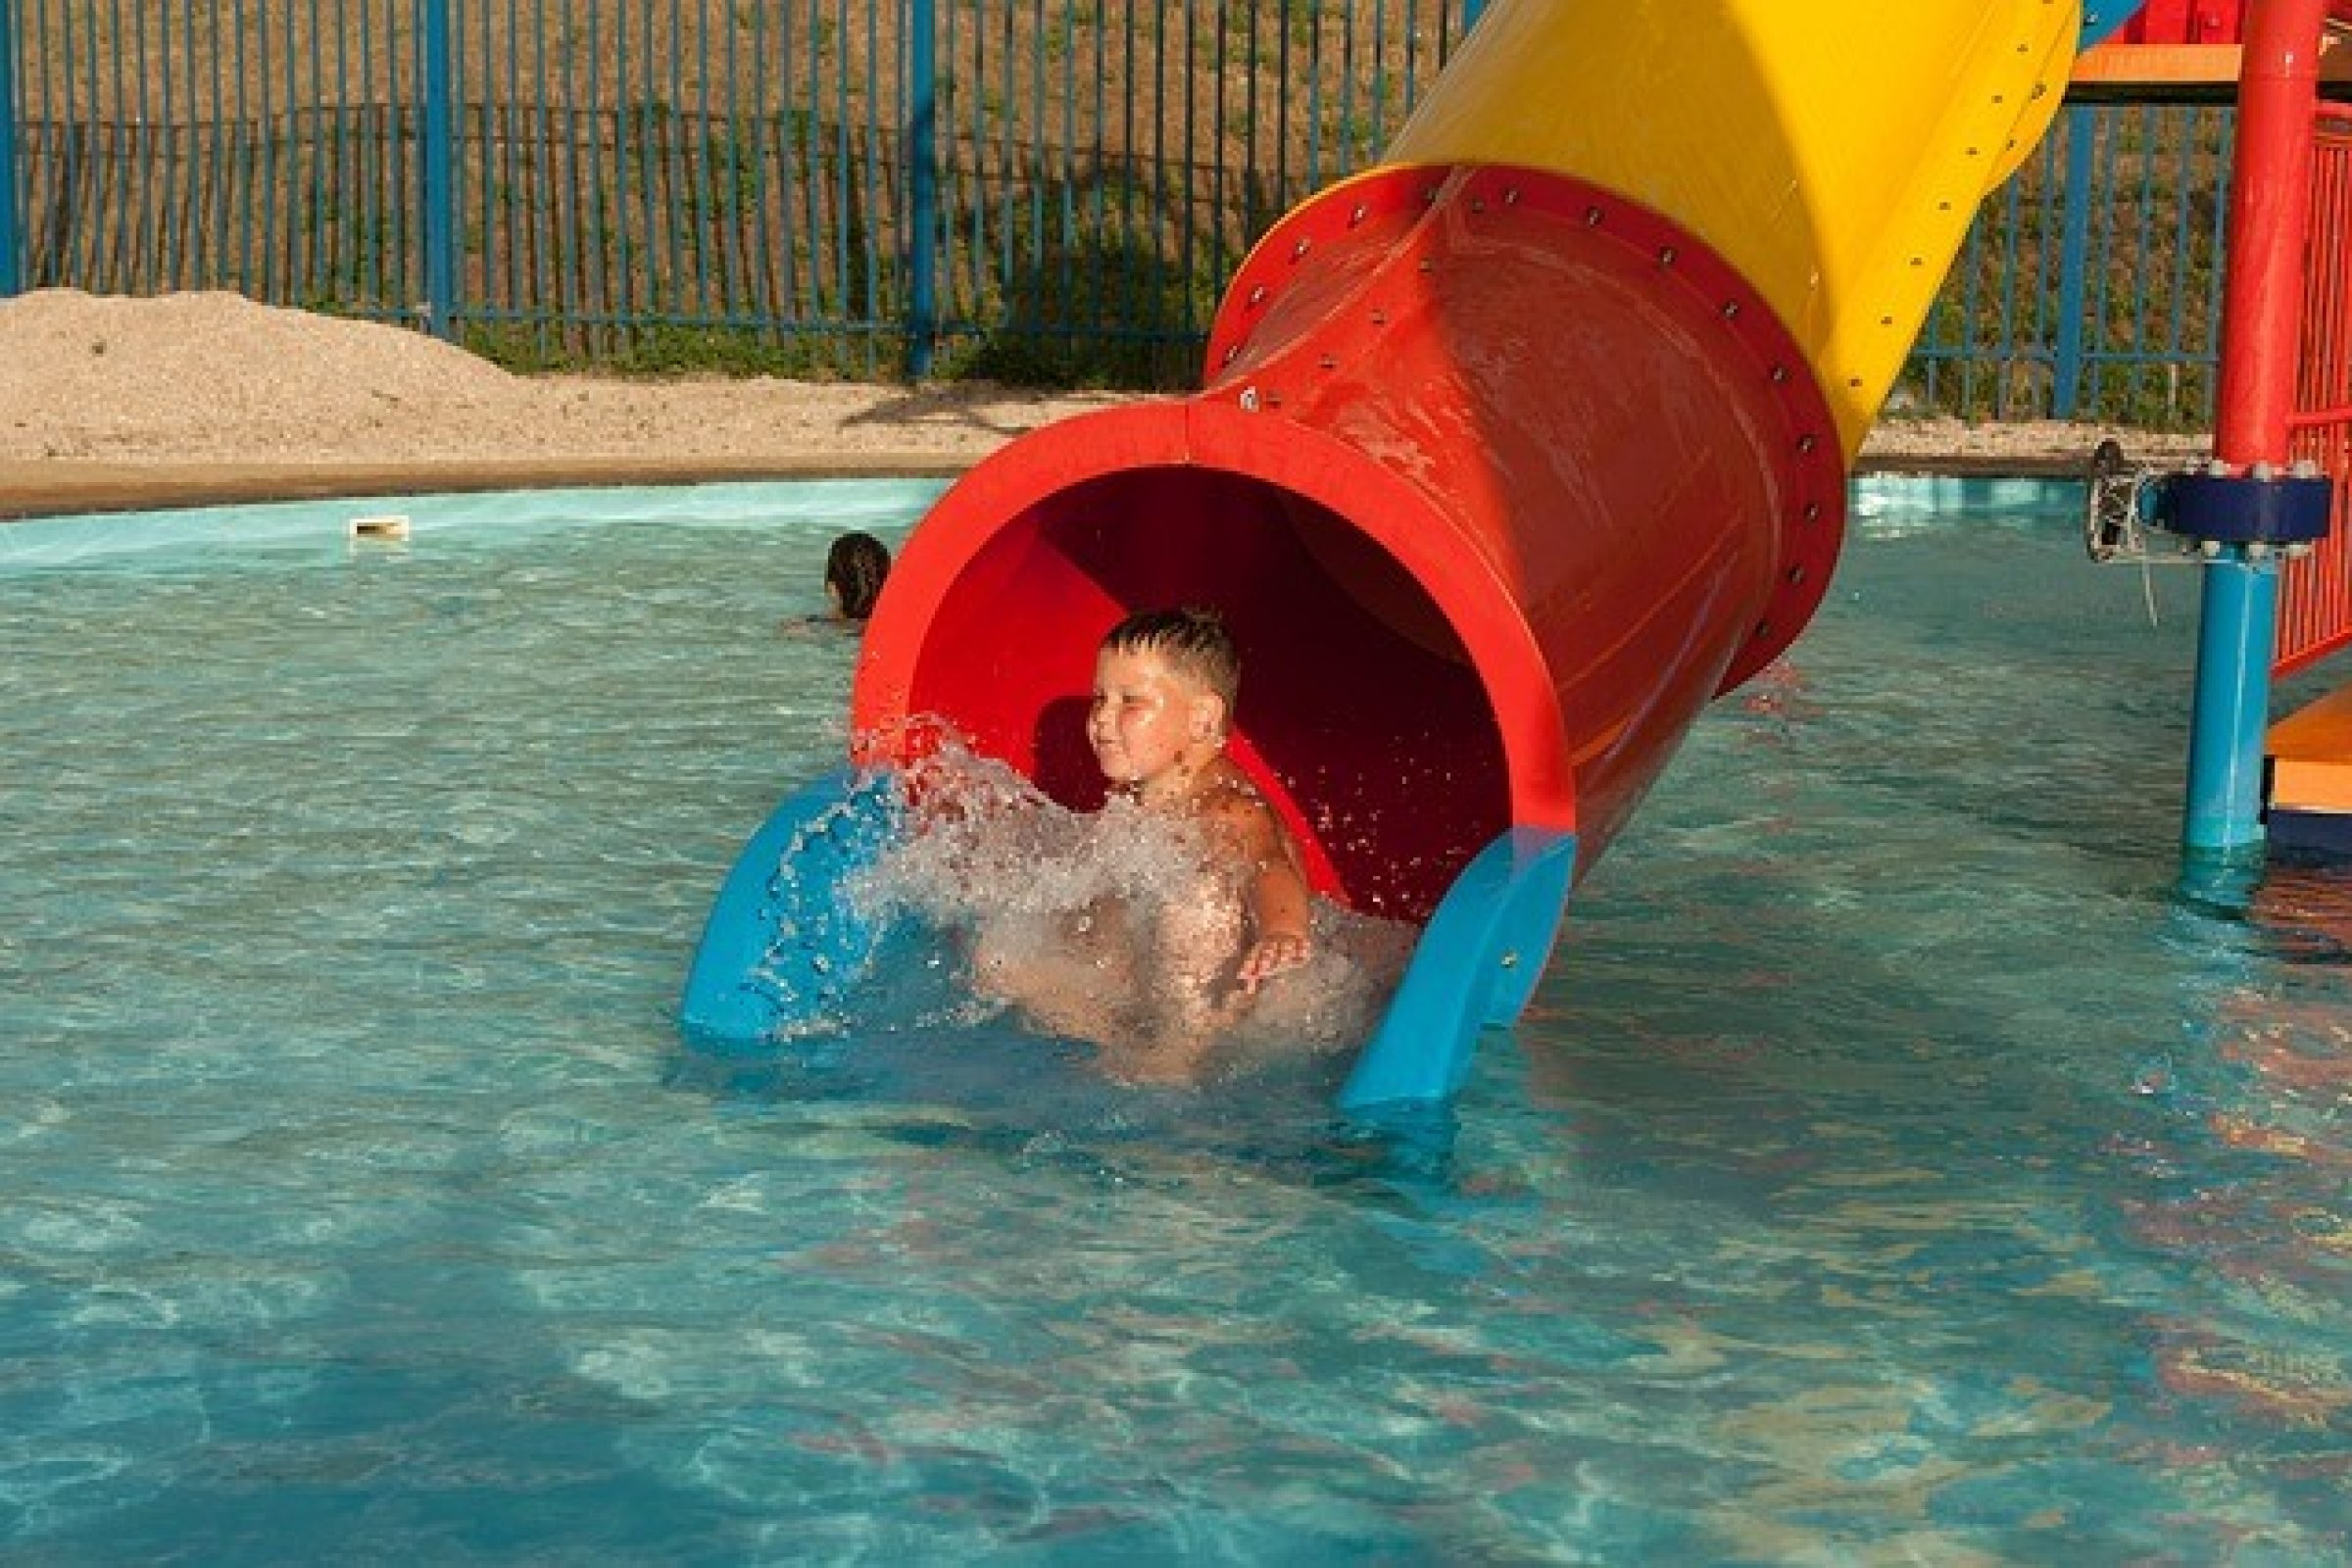 Splash Down kids ride at Tower Park, Poole